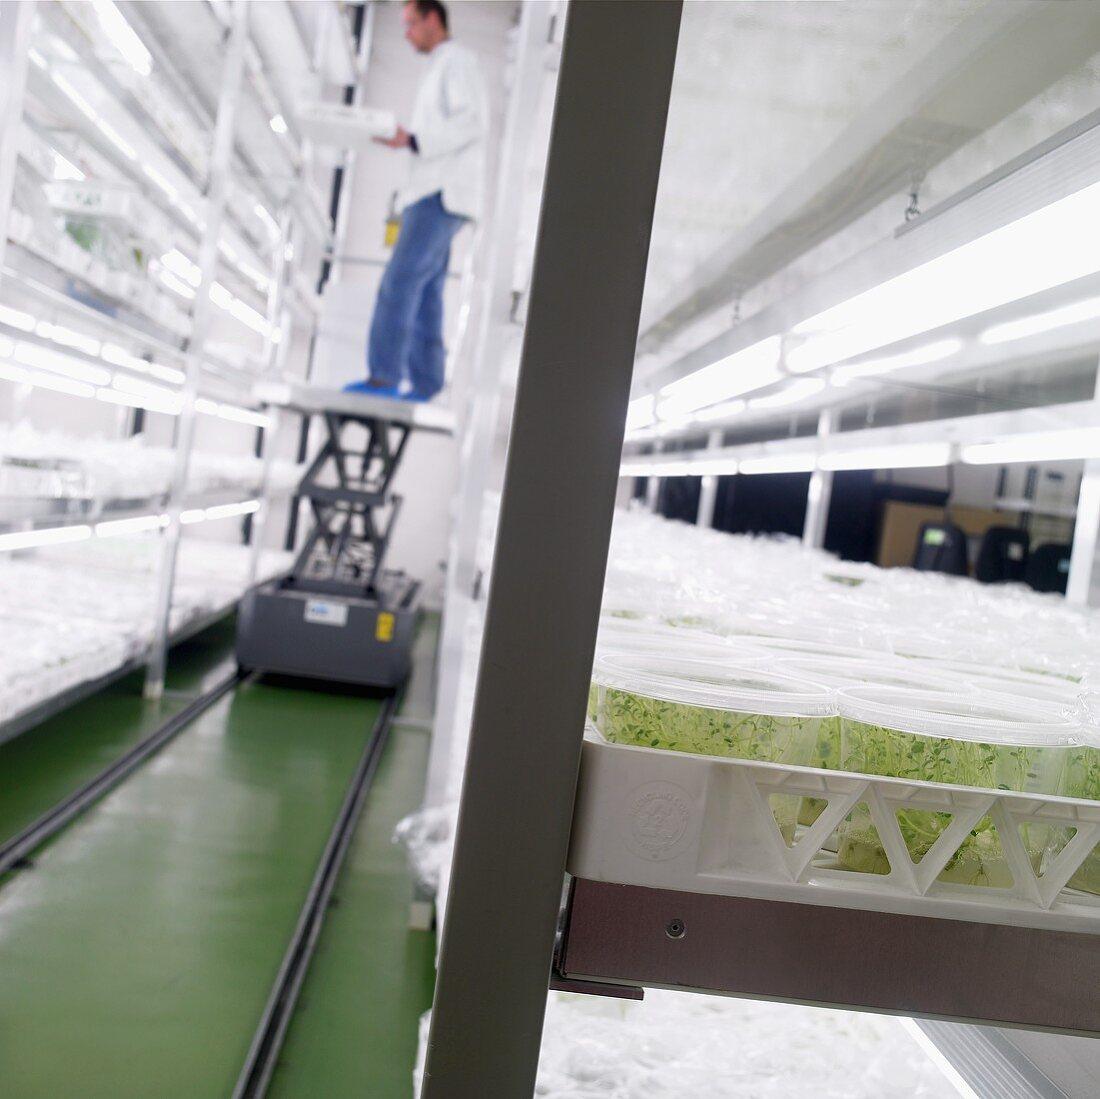 A plant laboratory